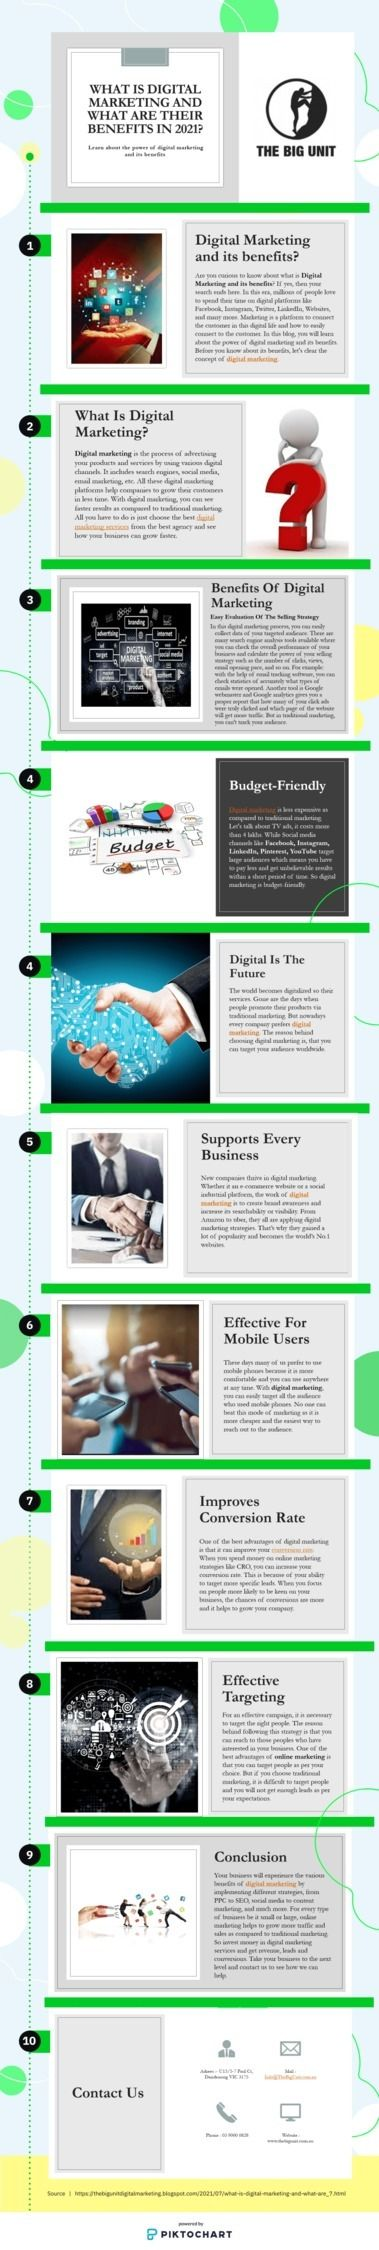 curious Digital Marketing benef - thebigunit | ello